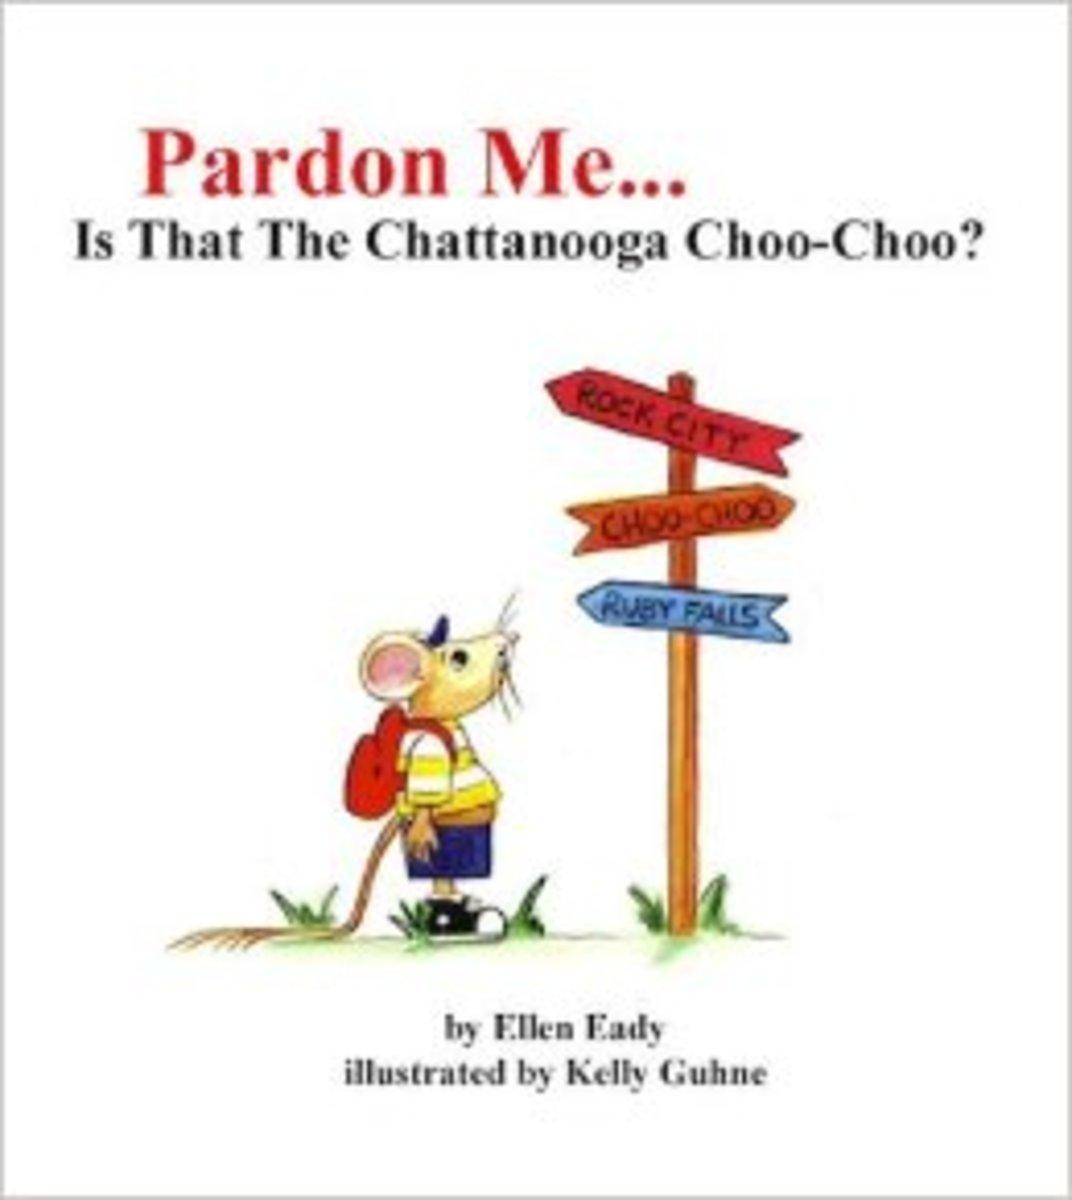 Pardon Me is that the Chattanooga Choo-Choo? by Ellen Eady